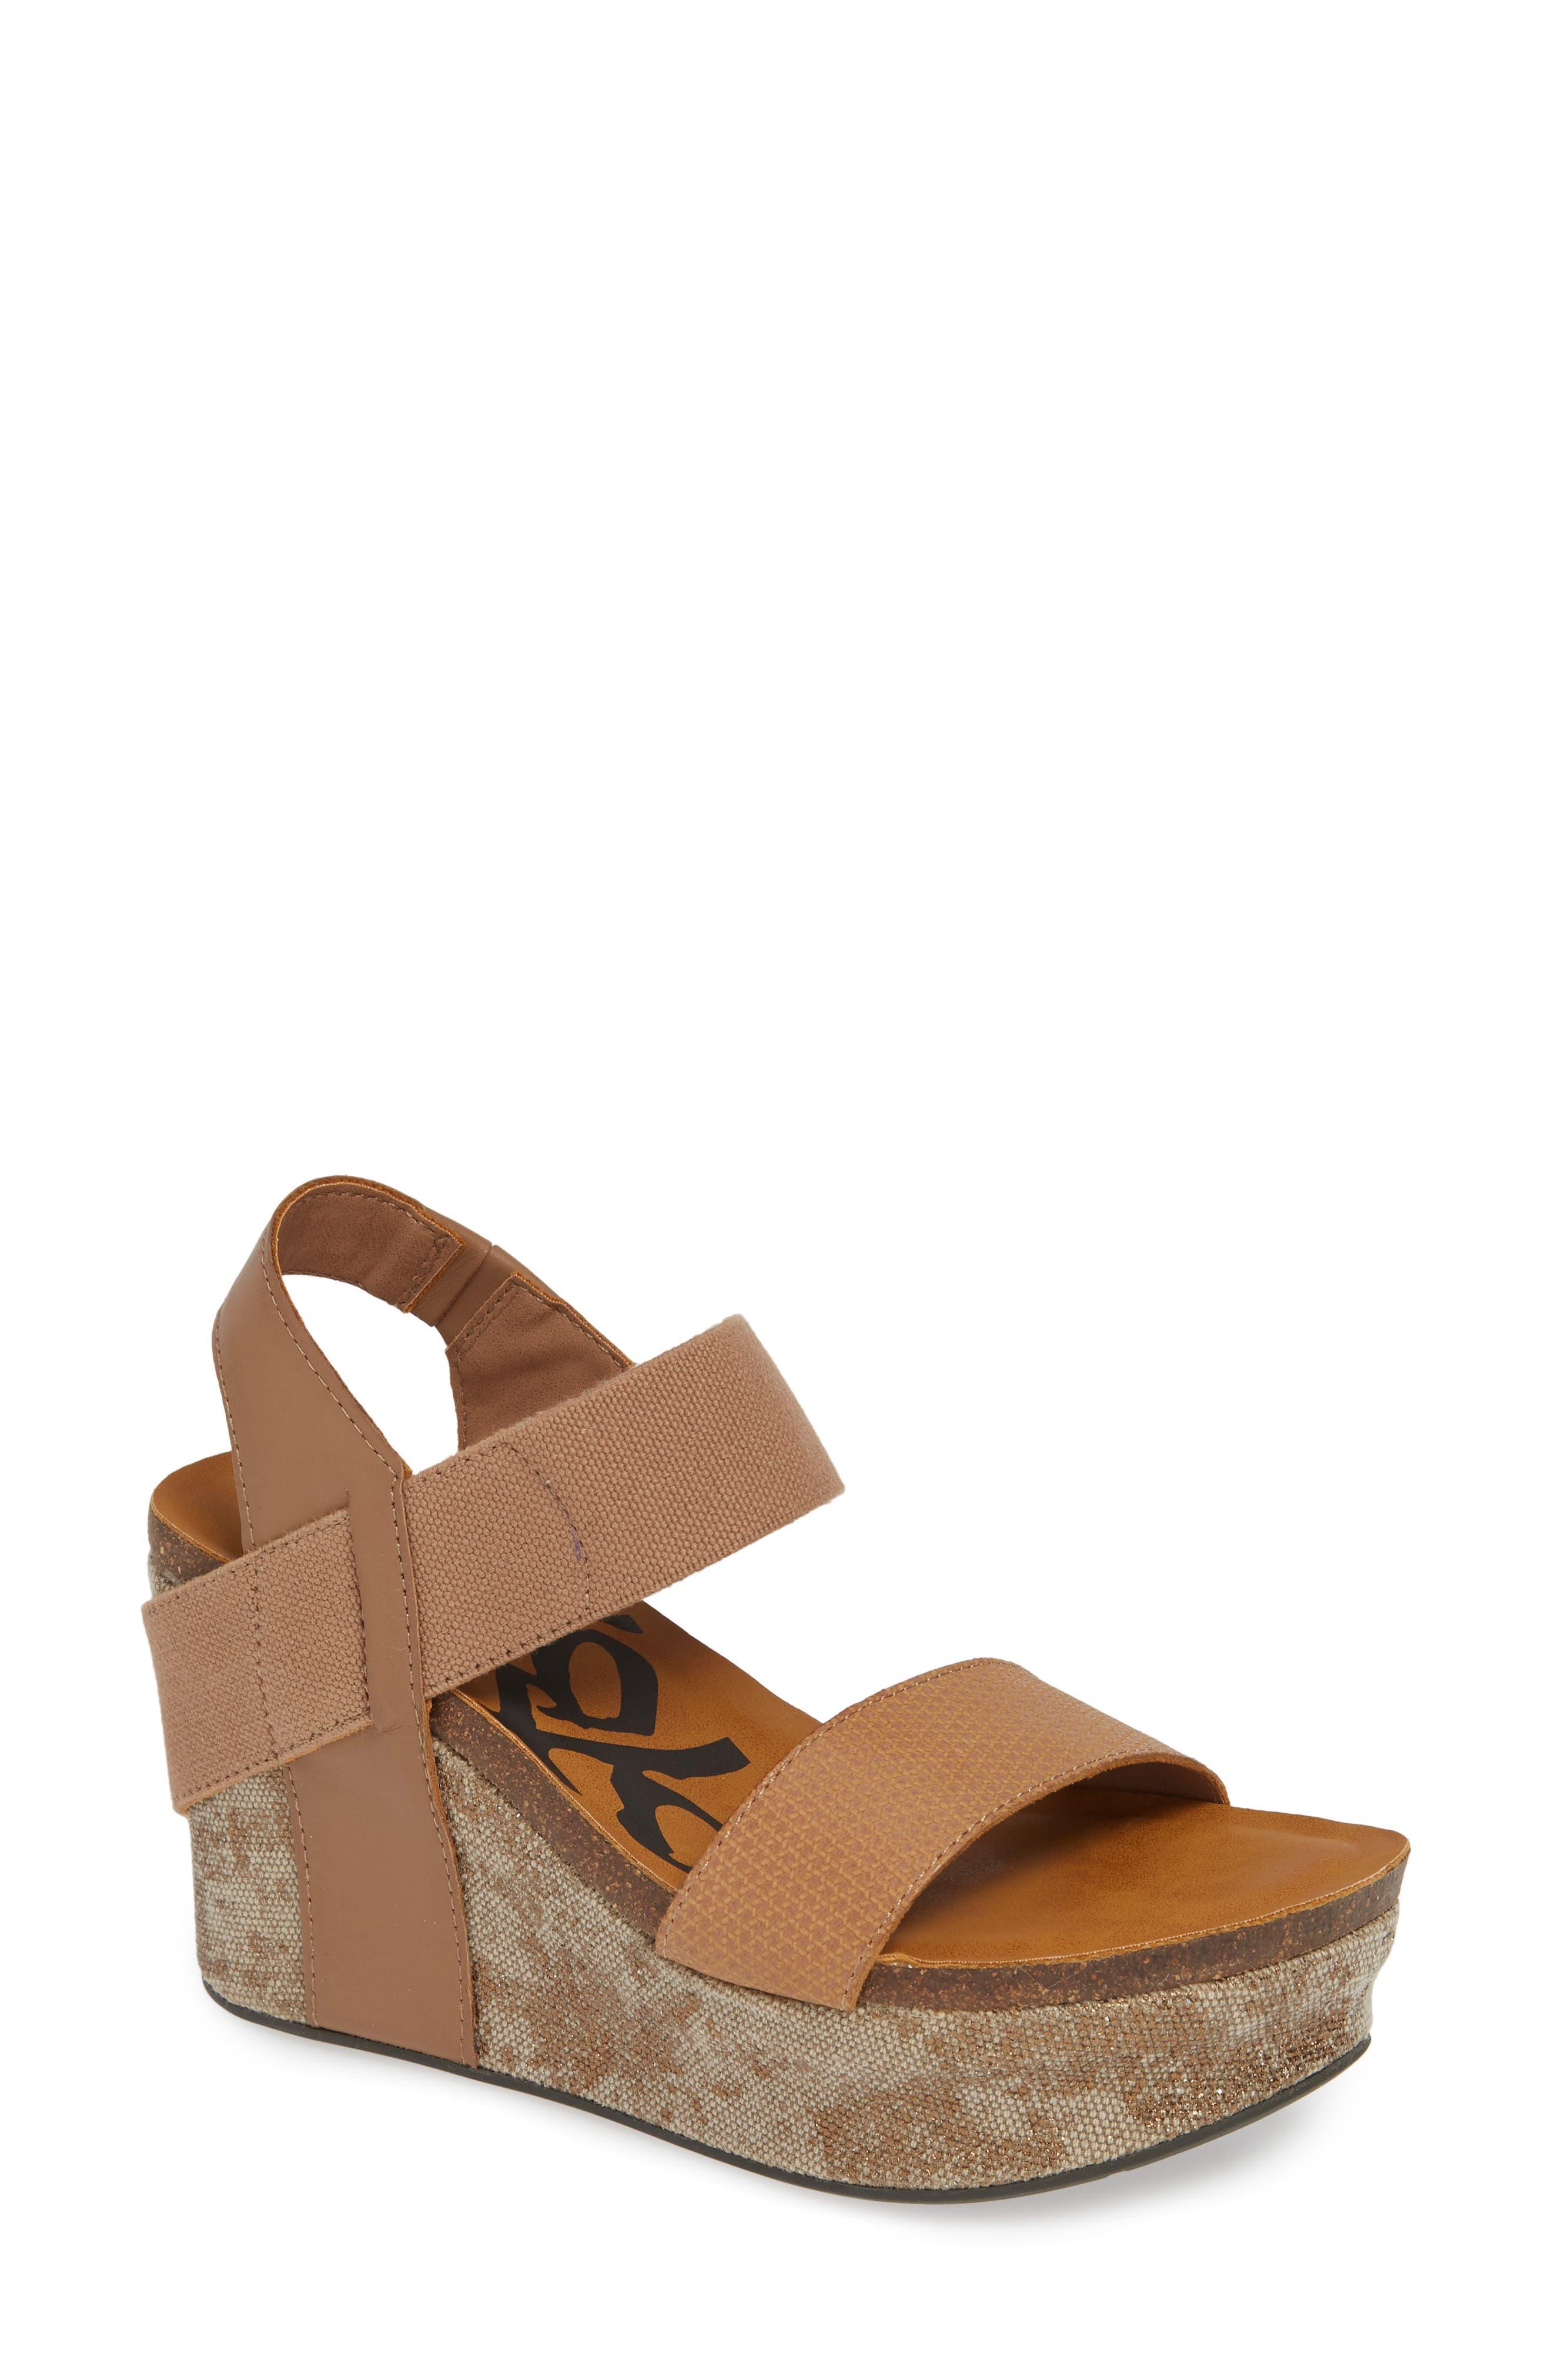 OTBT 'Bushnell' Wedge Sandal, Main, color, TAUPE LEATHER